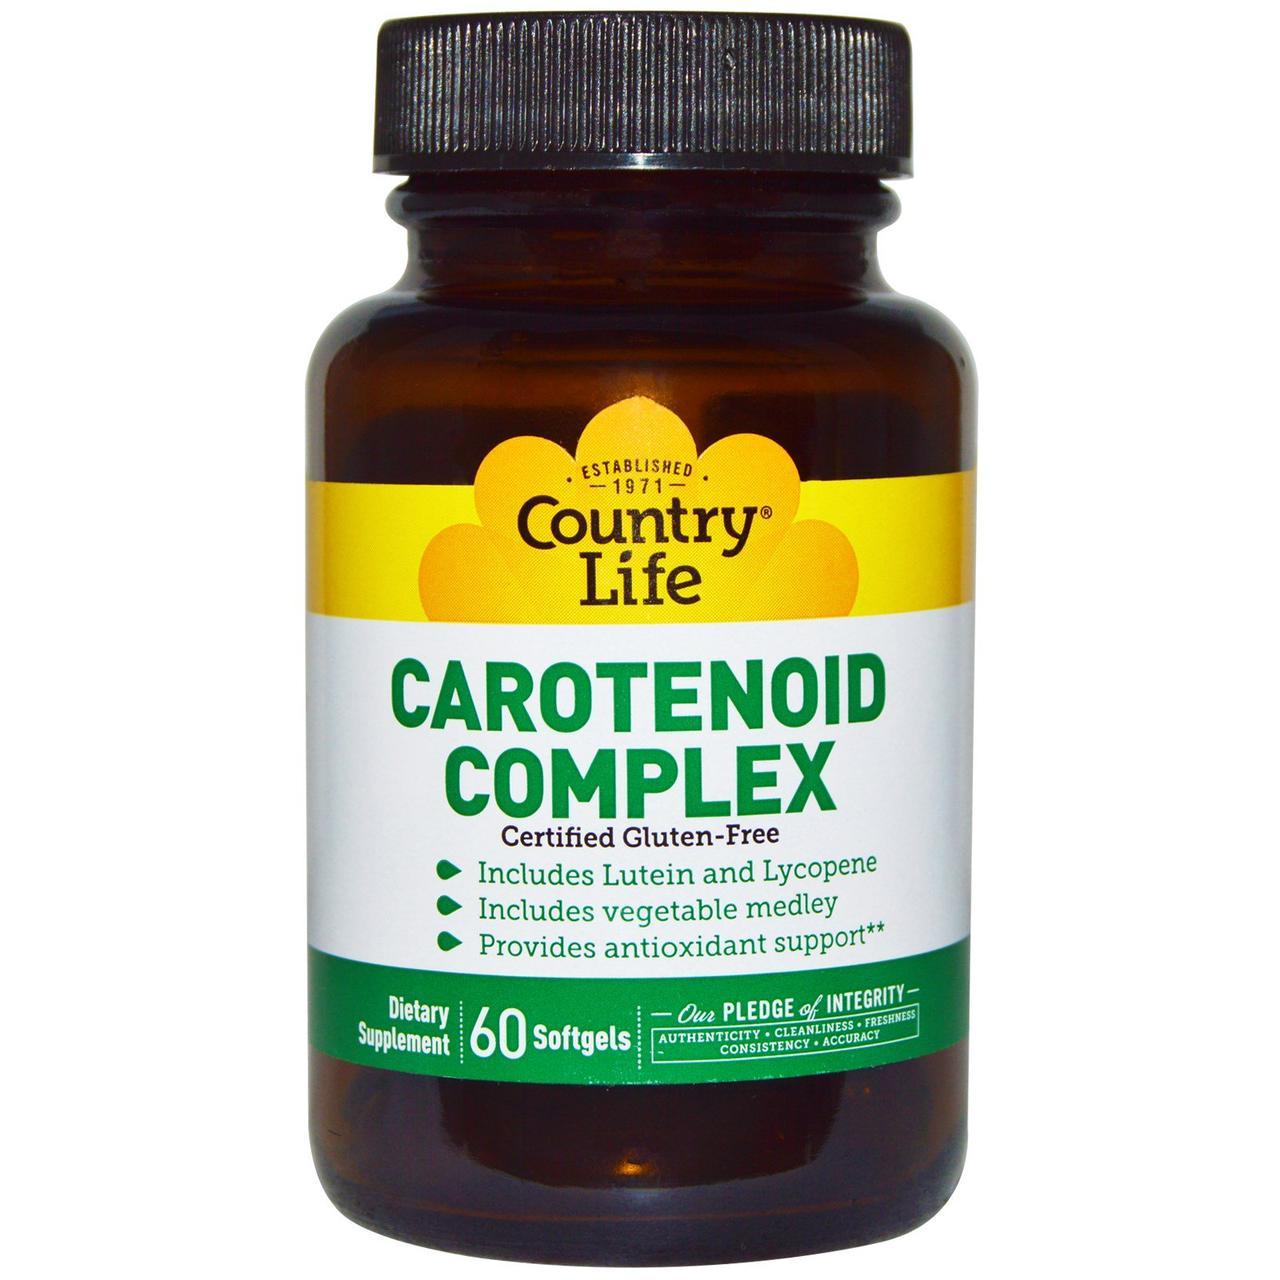 Комплекс каротиноидов, Carotenoid Complex, Country Life, 60 кап.